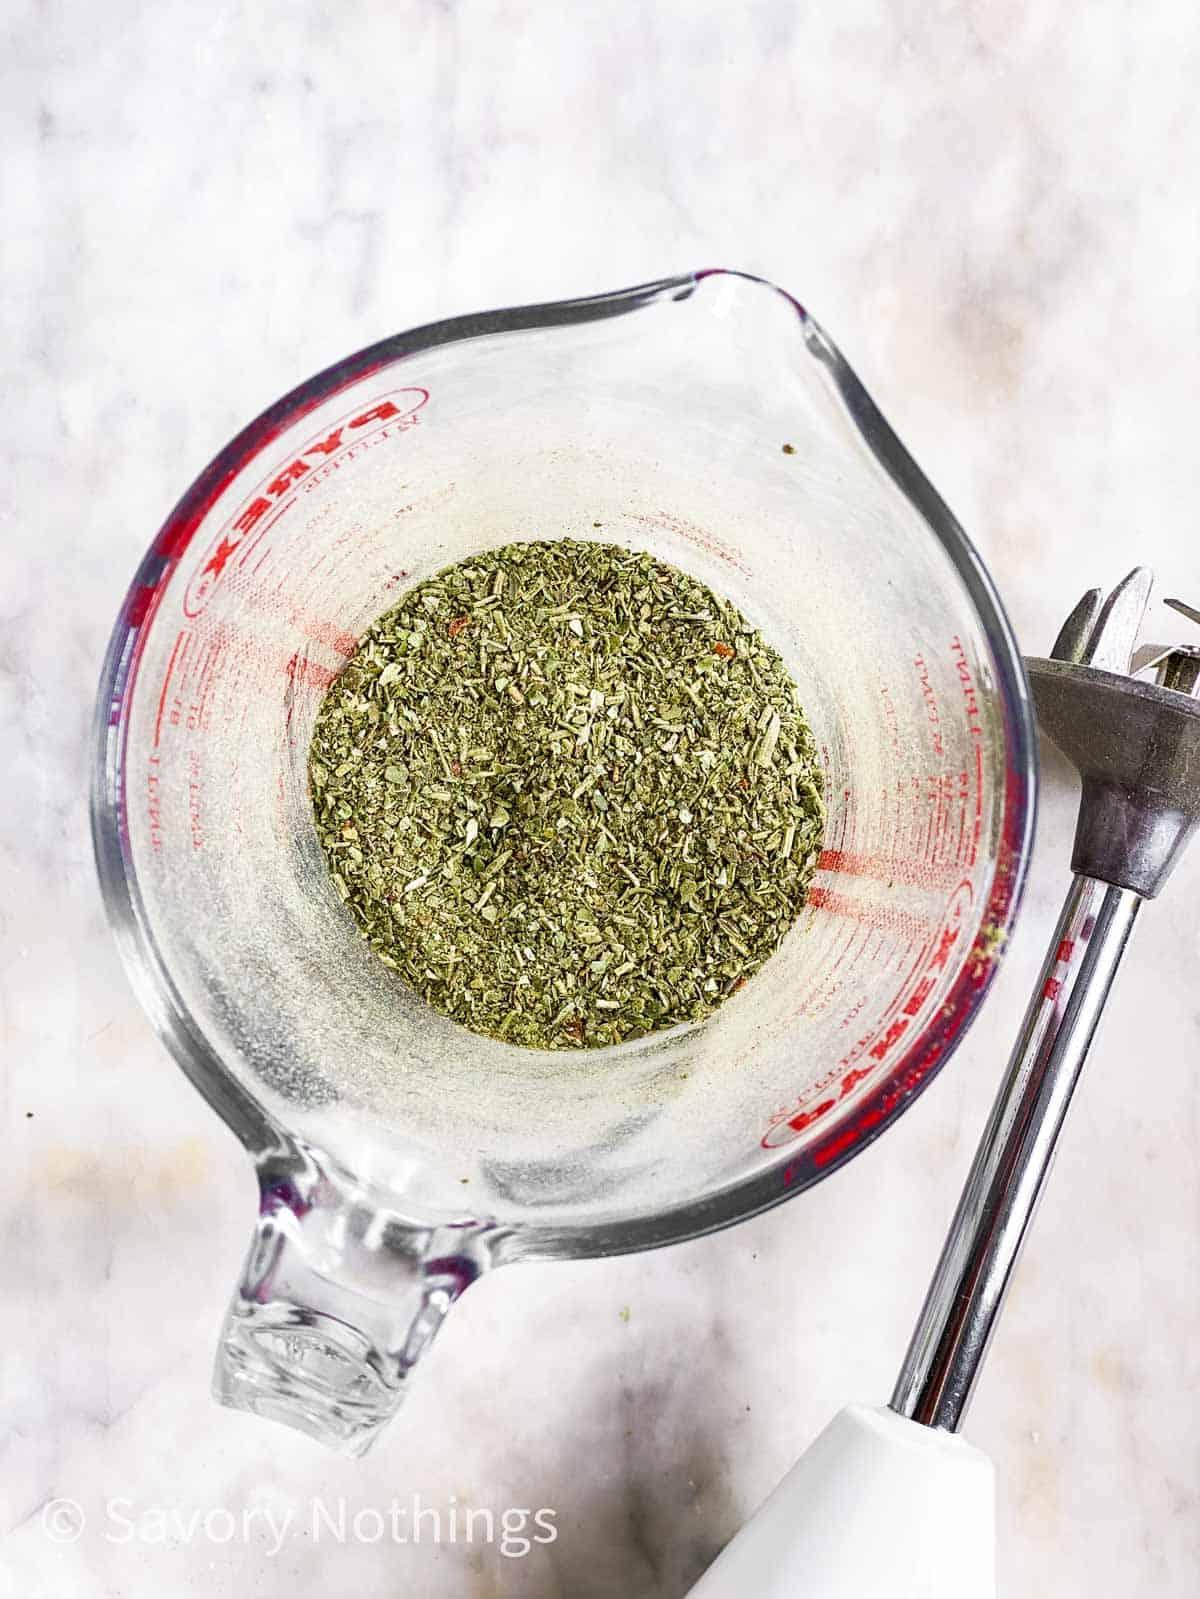 homemade Italian seasoning in glass measuring jug next to an immersion blender